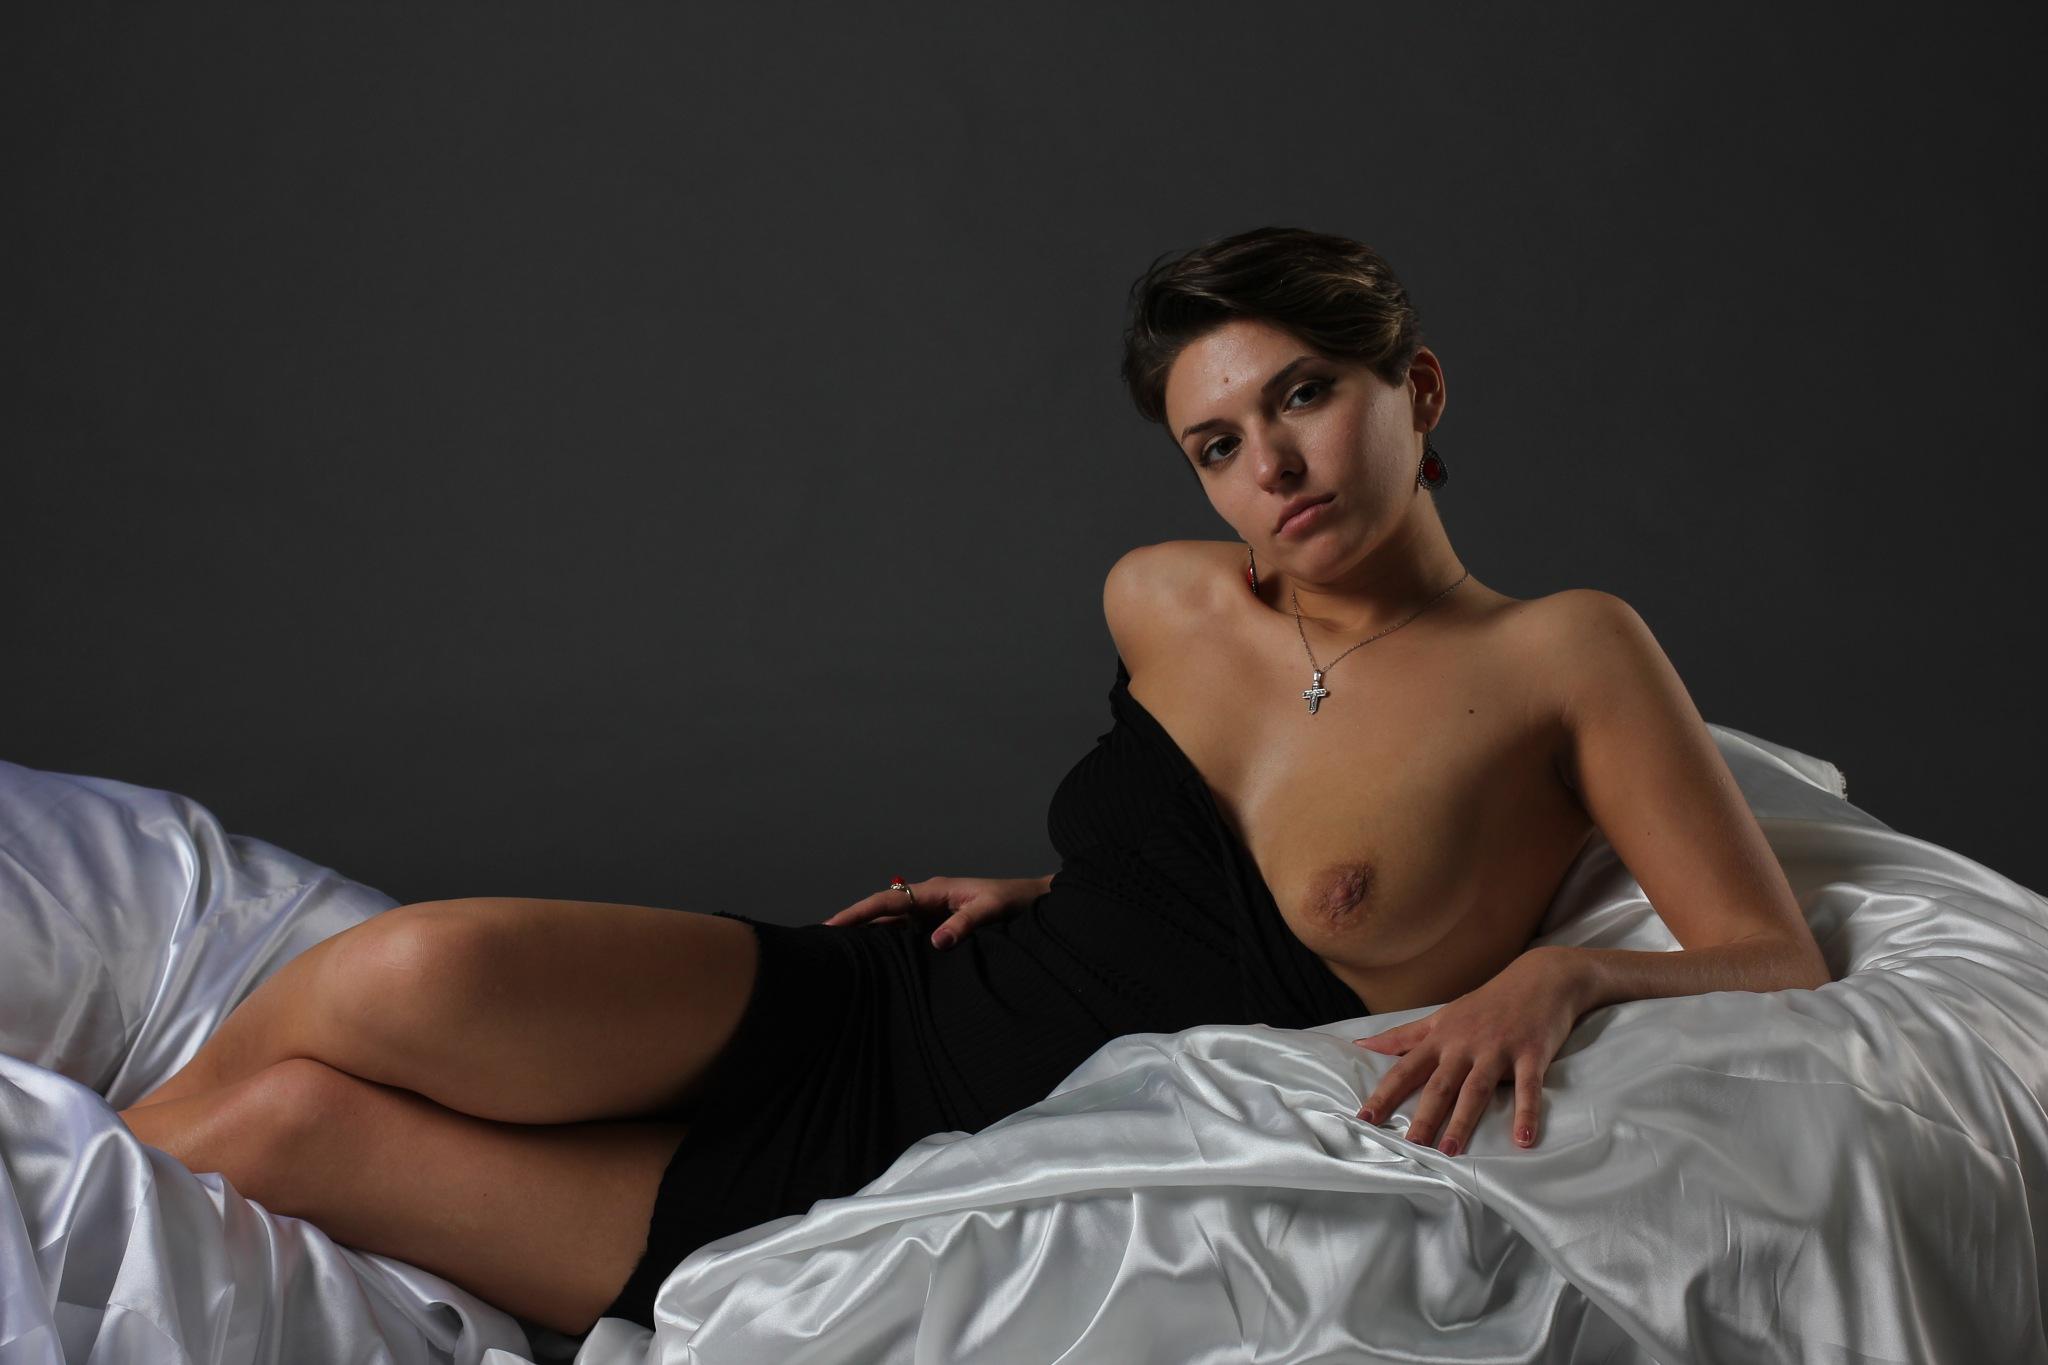 Tempting lady by Kriszen